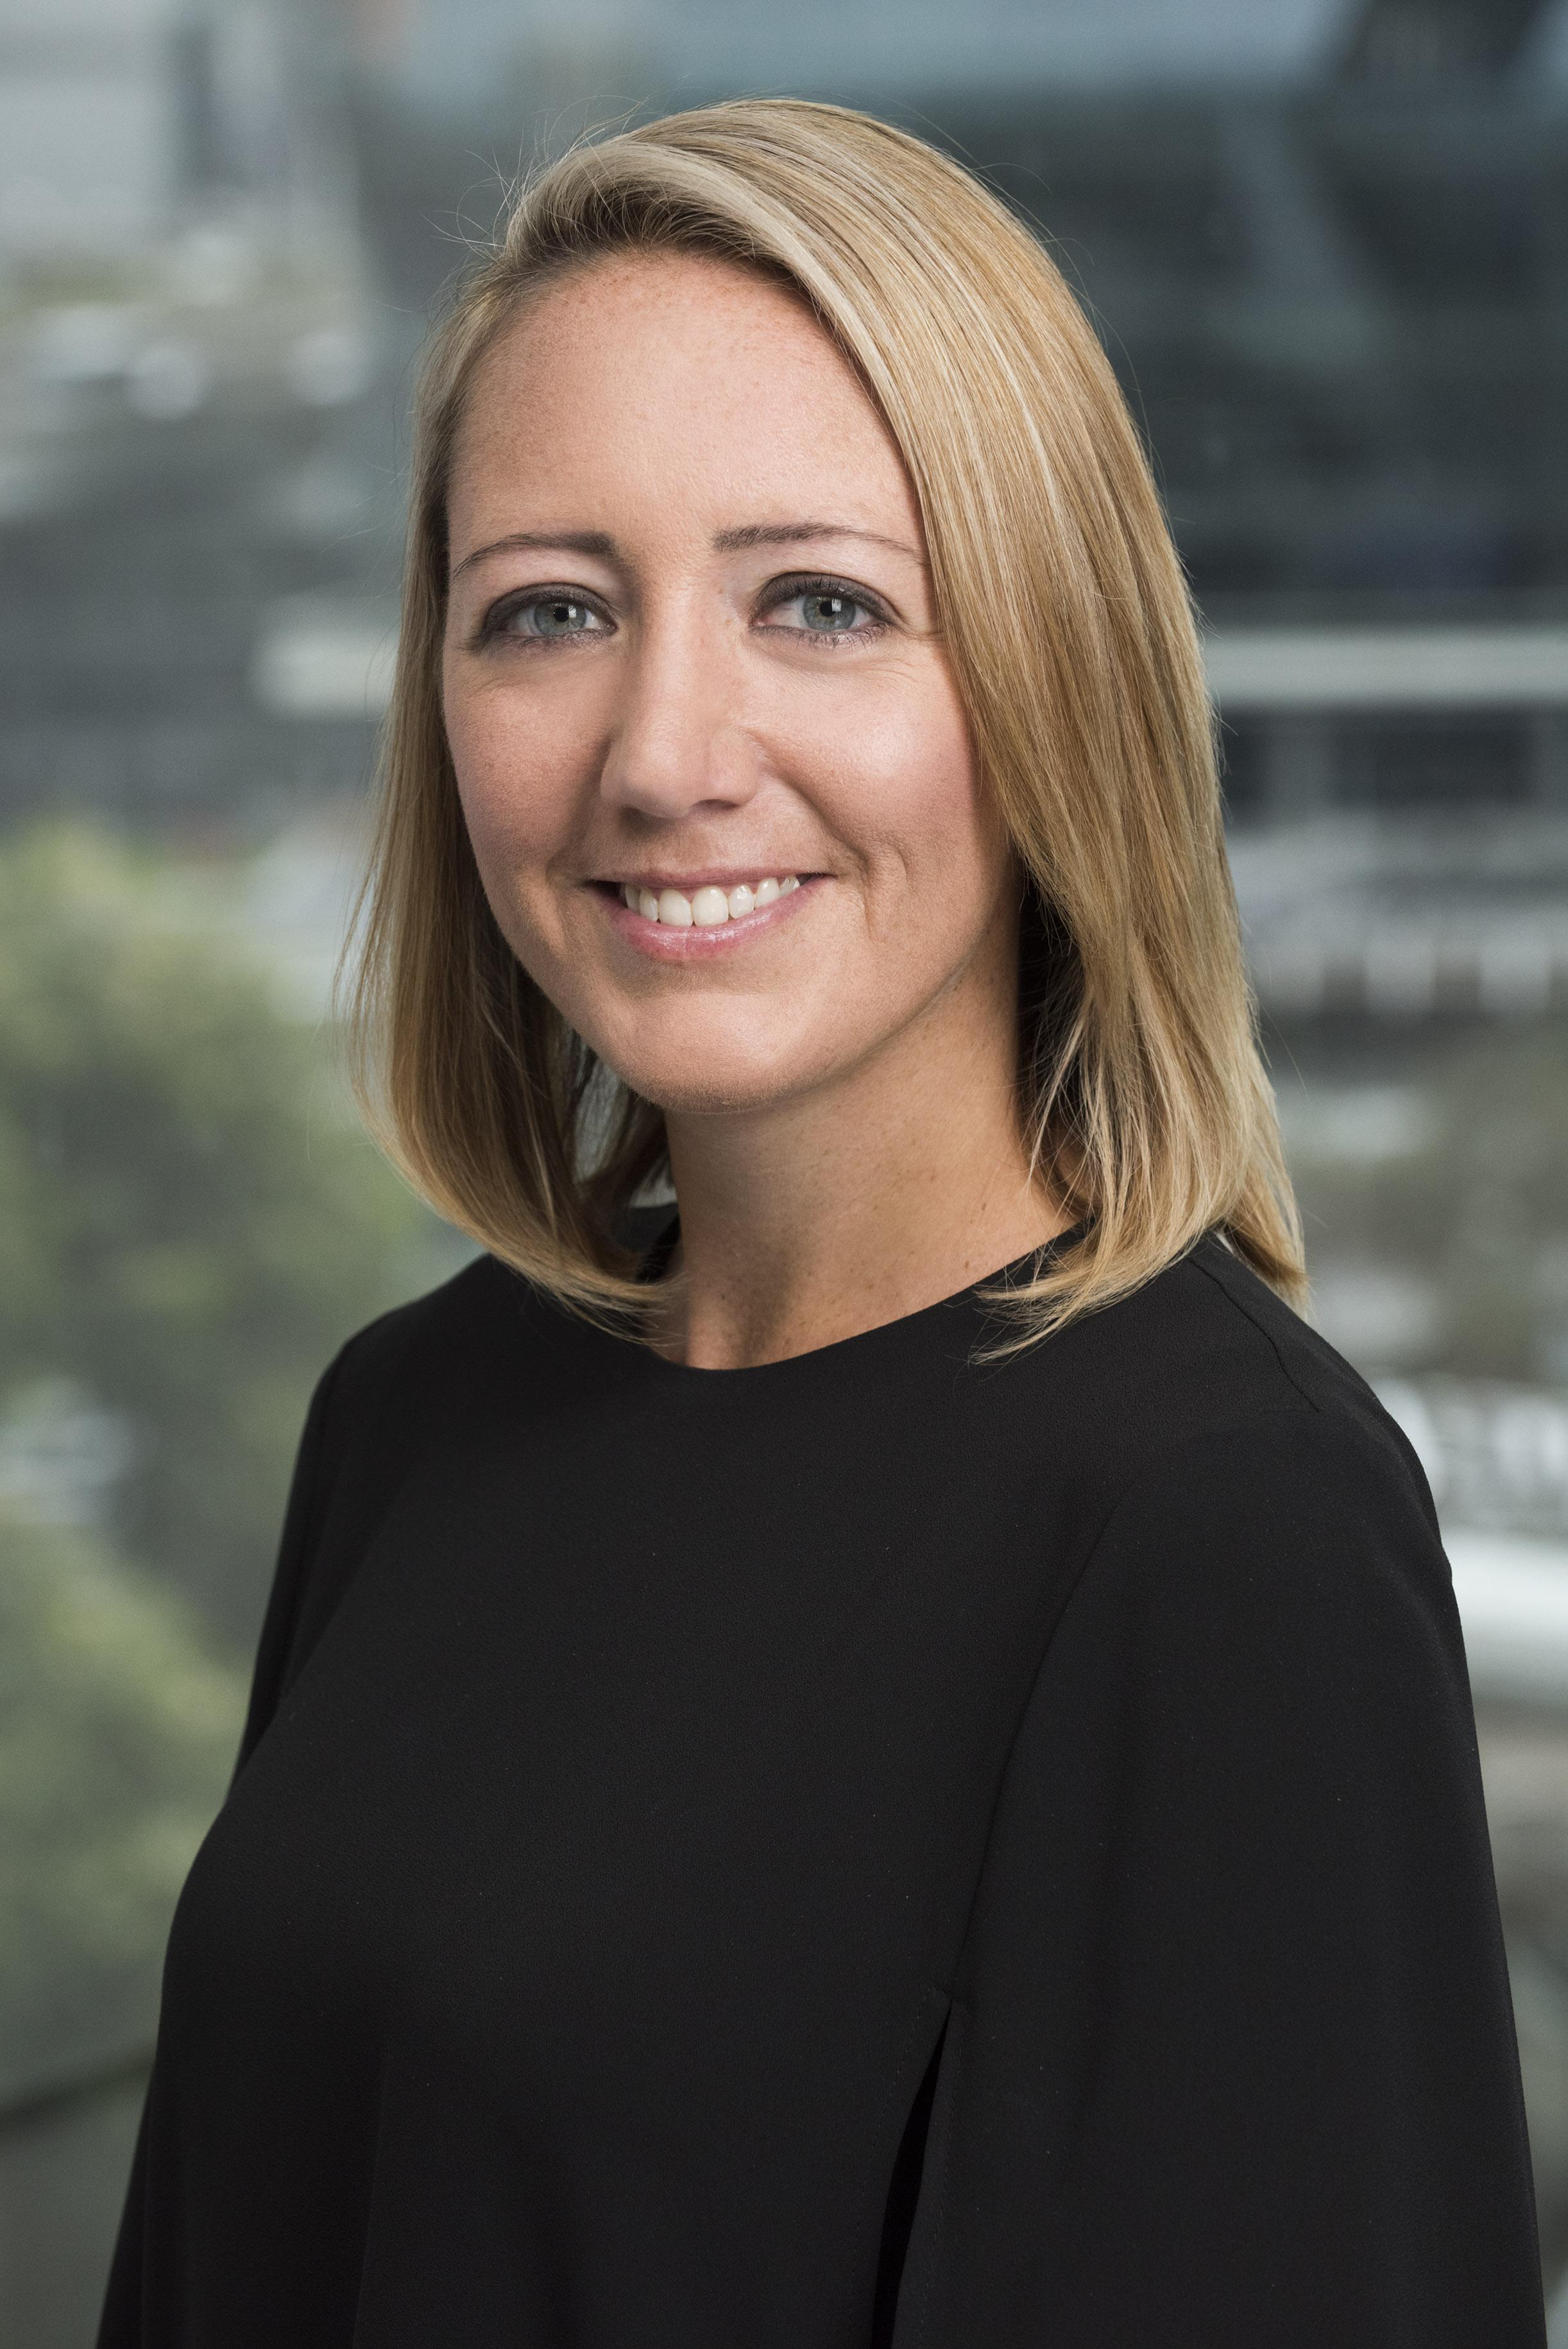 Angela McMillian